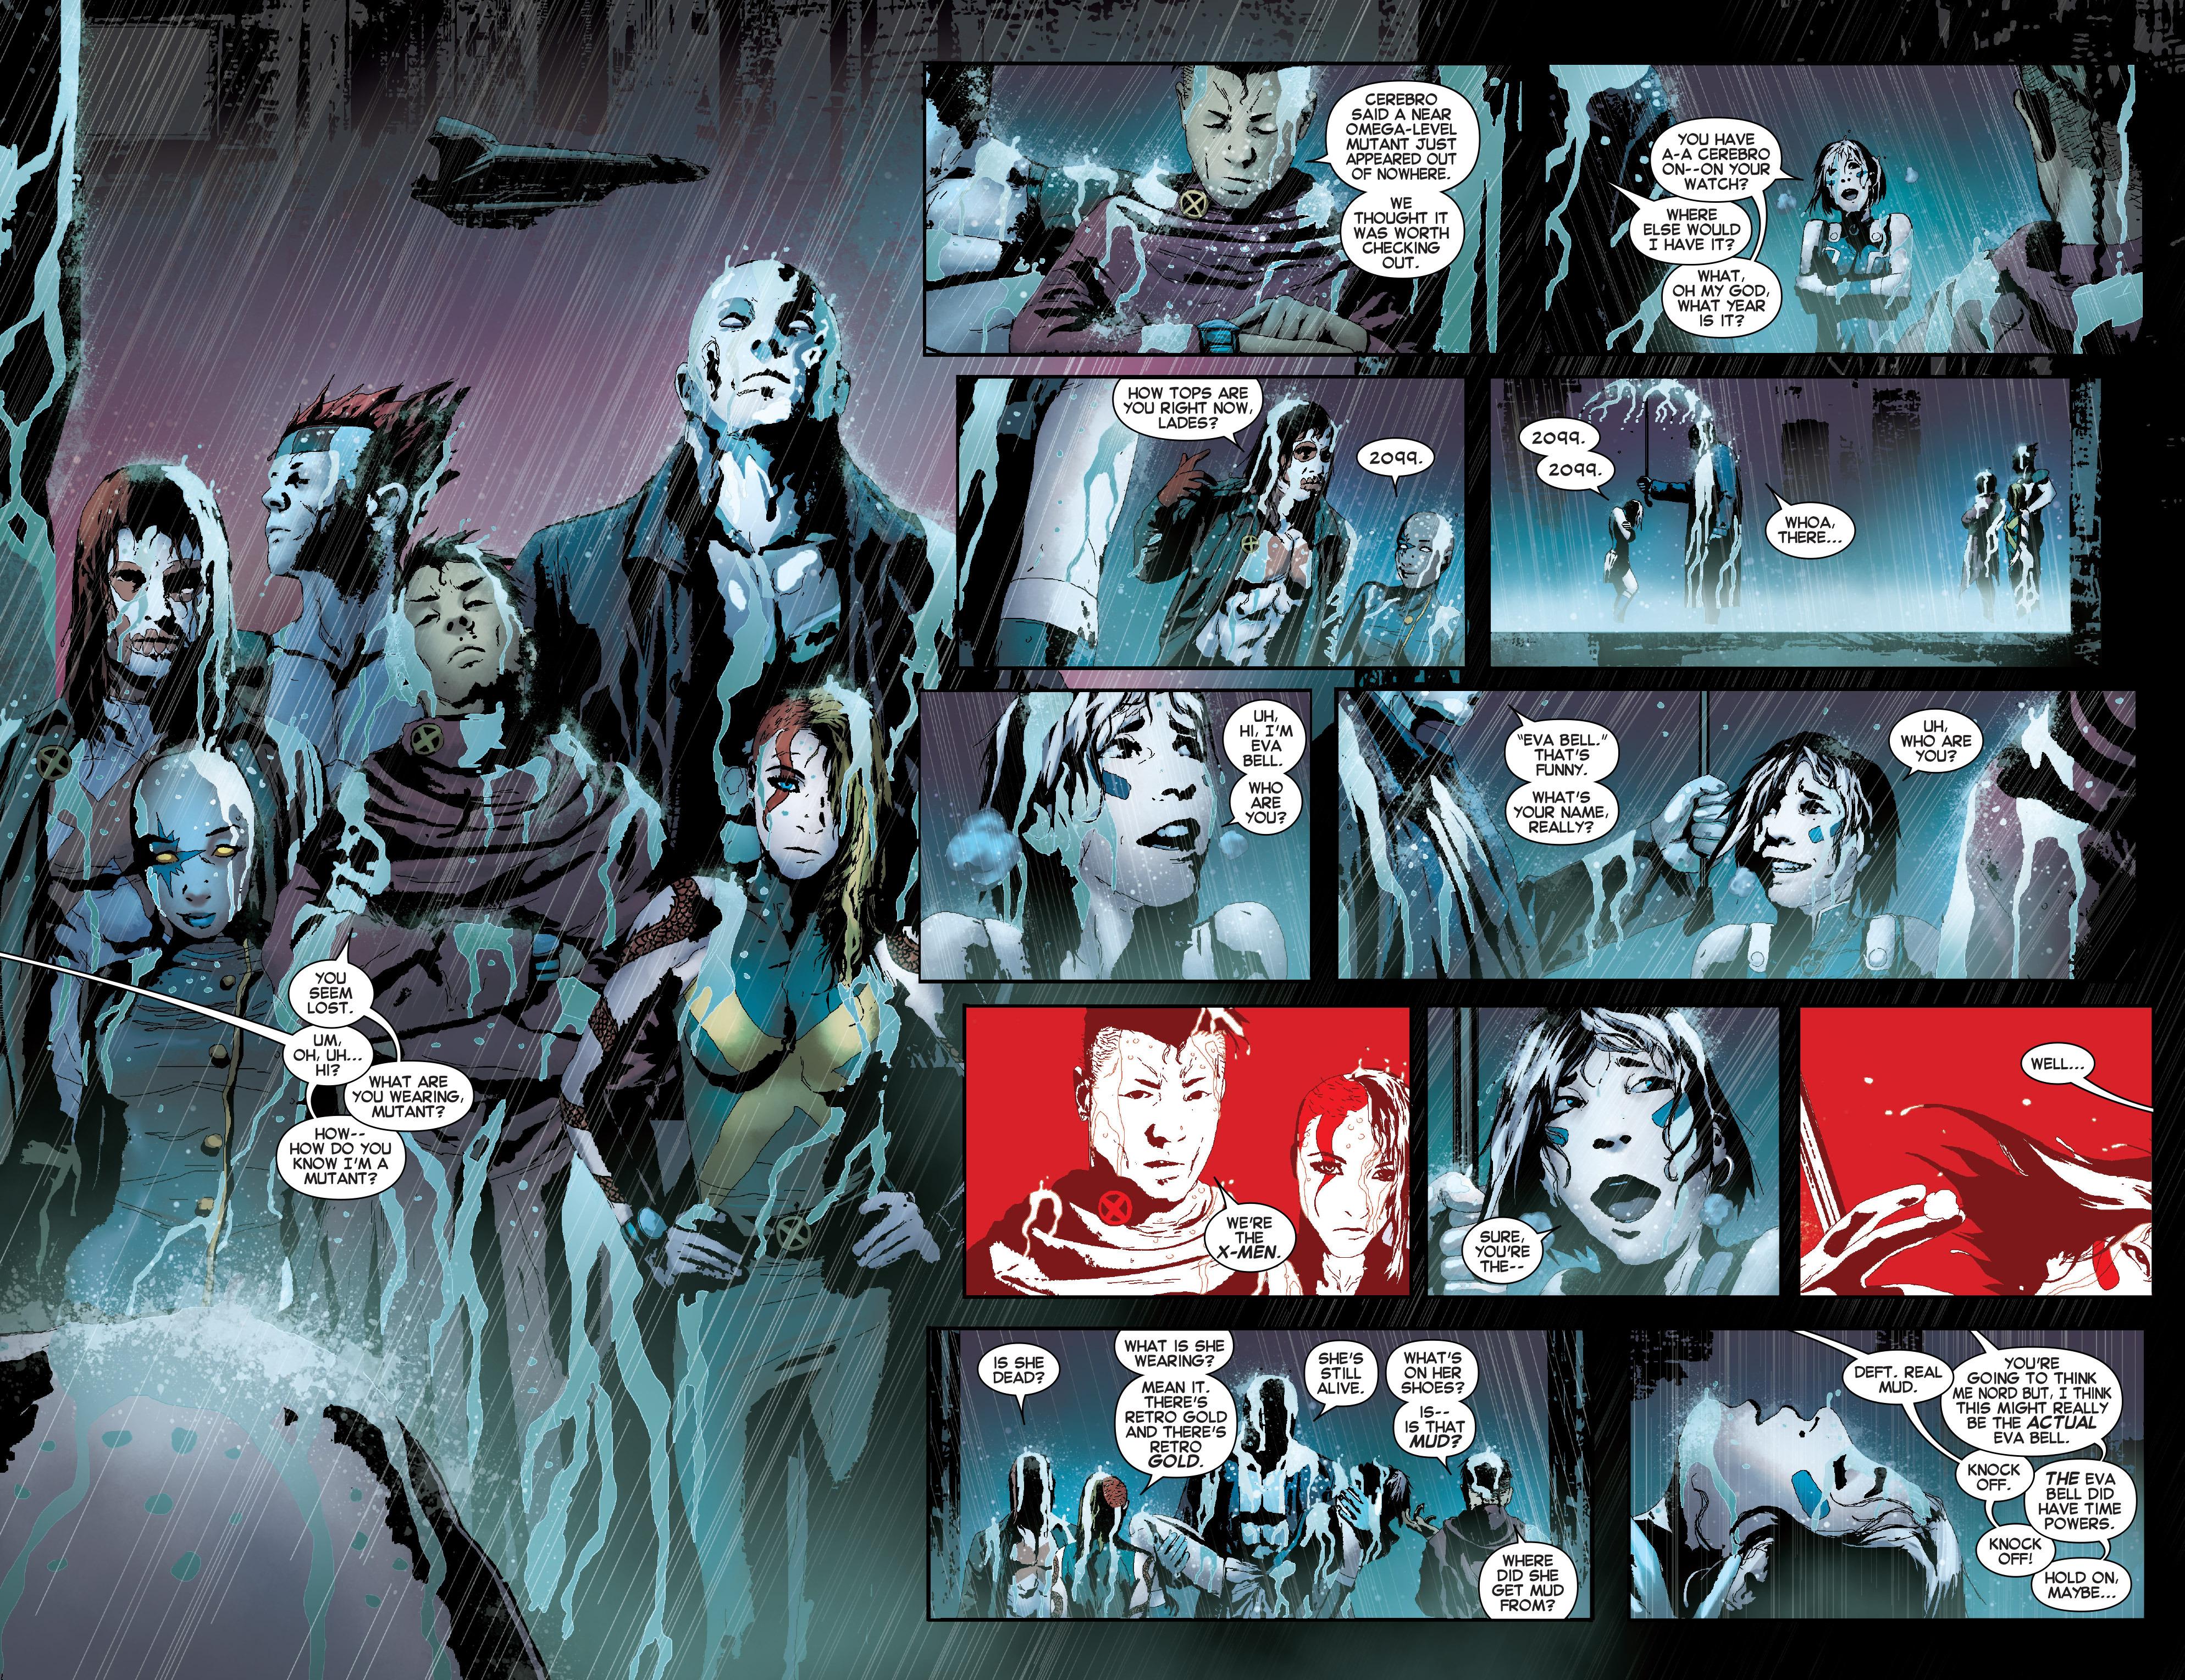 Read online Uncanny X-Men (2013) comic -  Issue # Annual 1 - 15